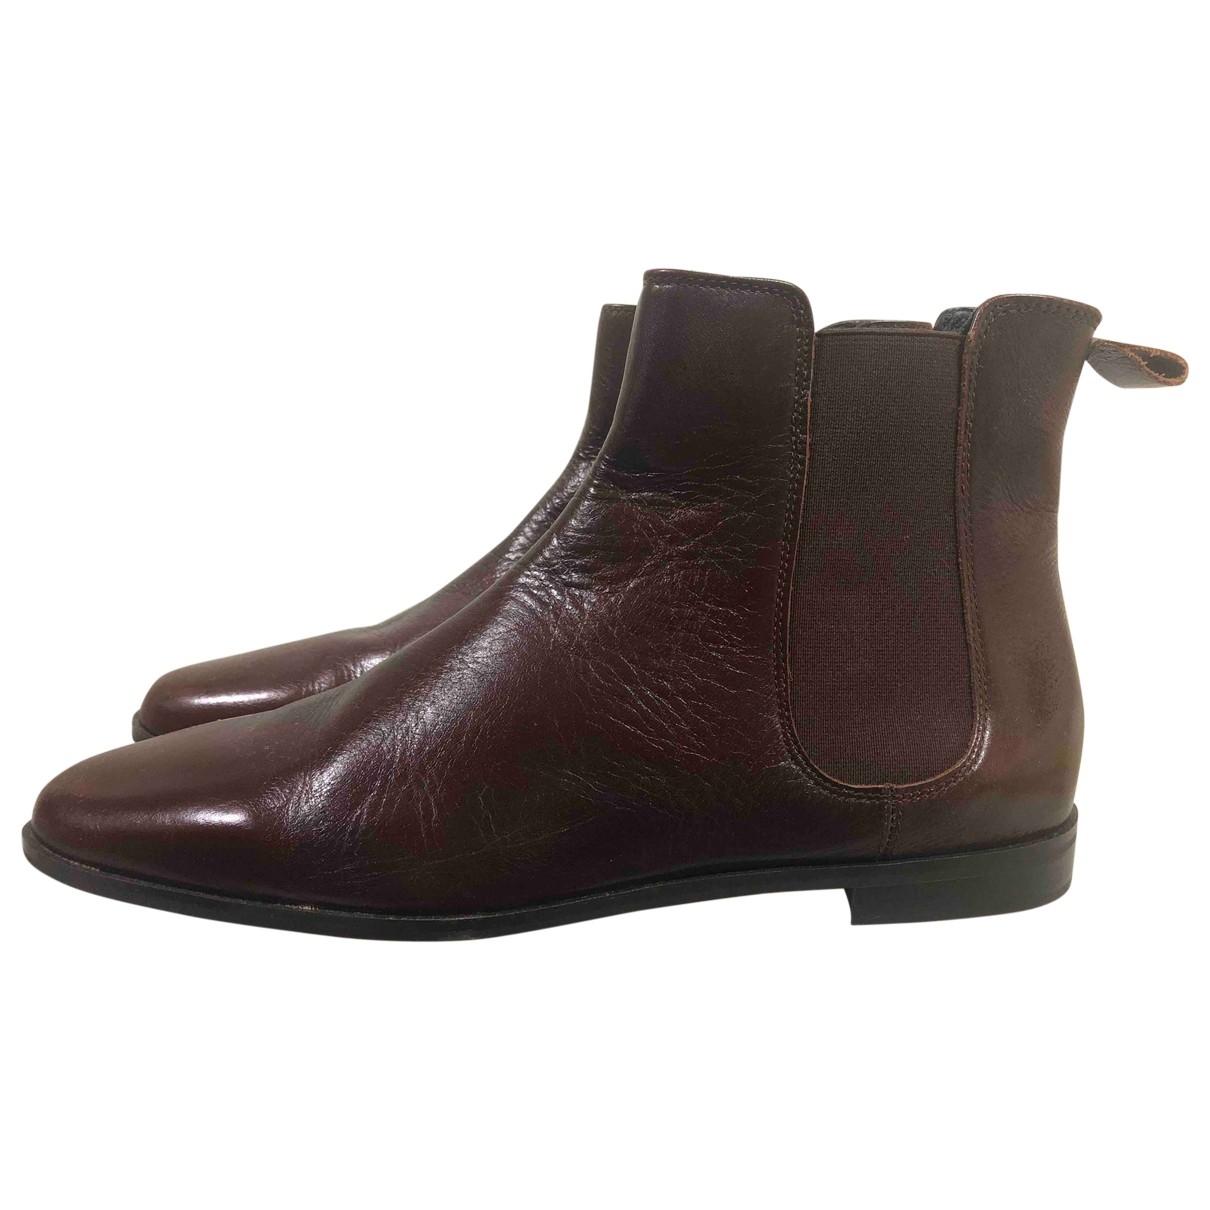 Zara \N Brown Leather Boots for Women 41 EU